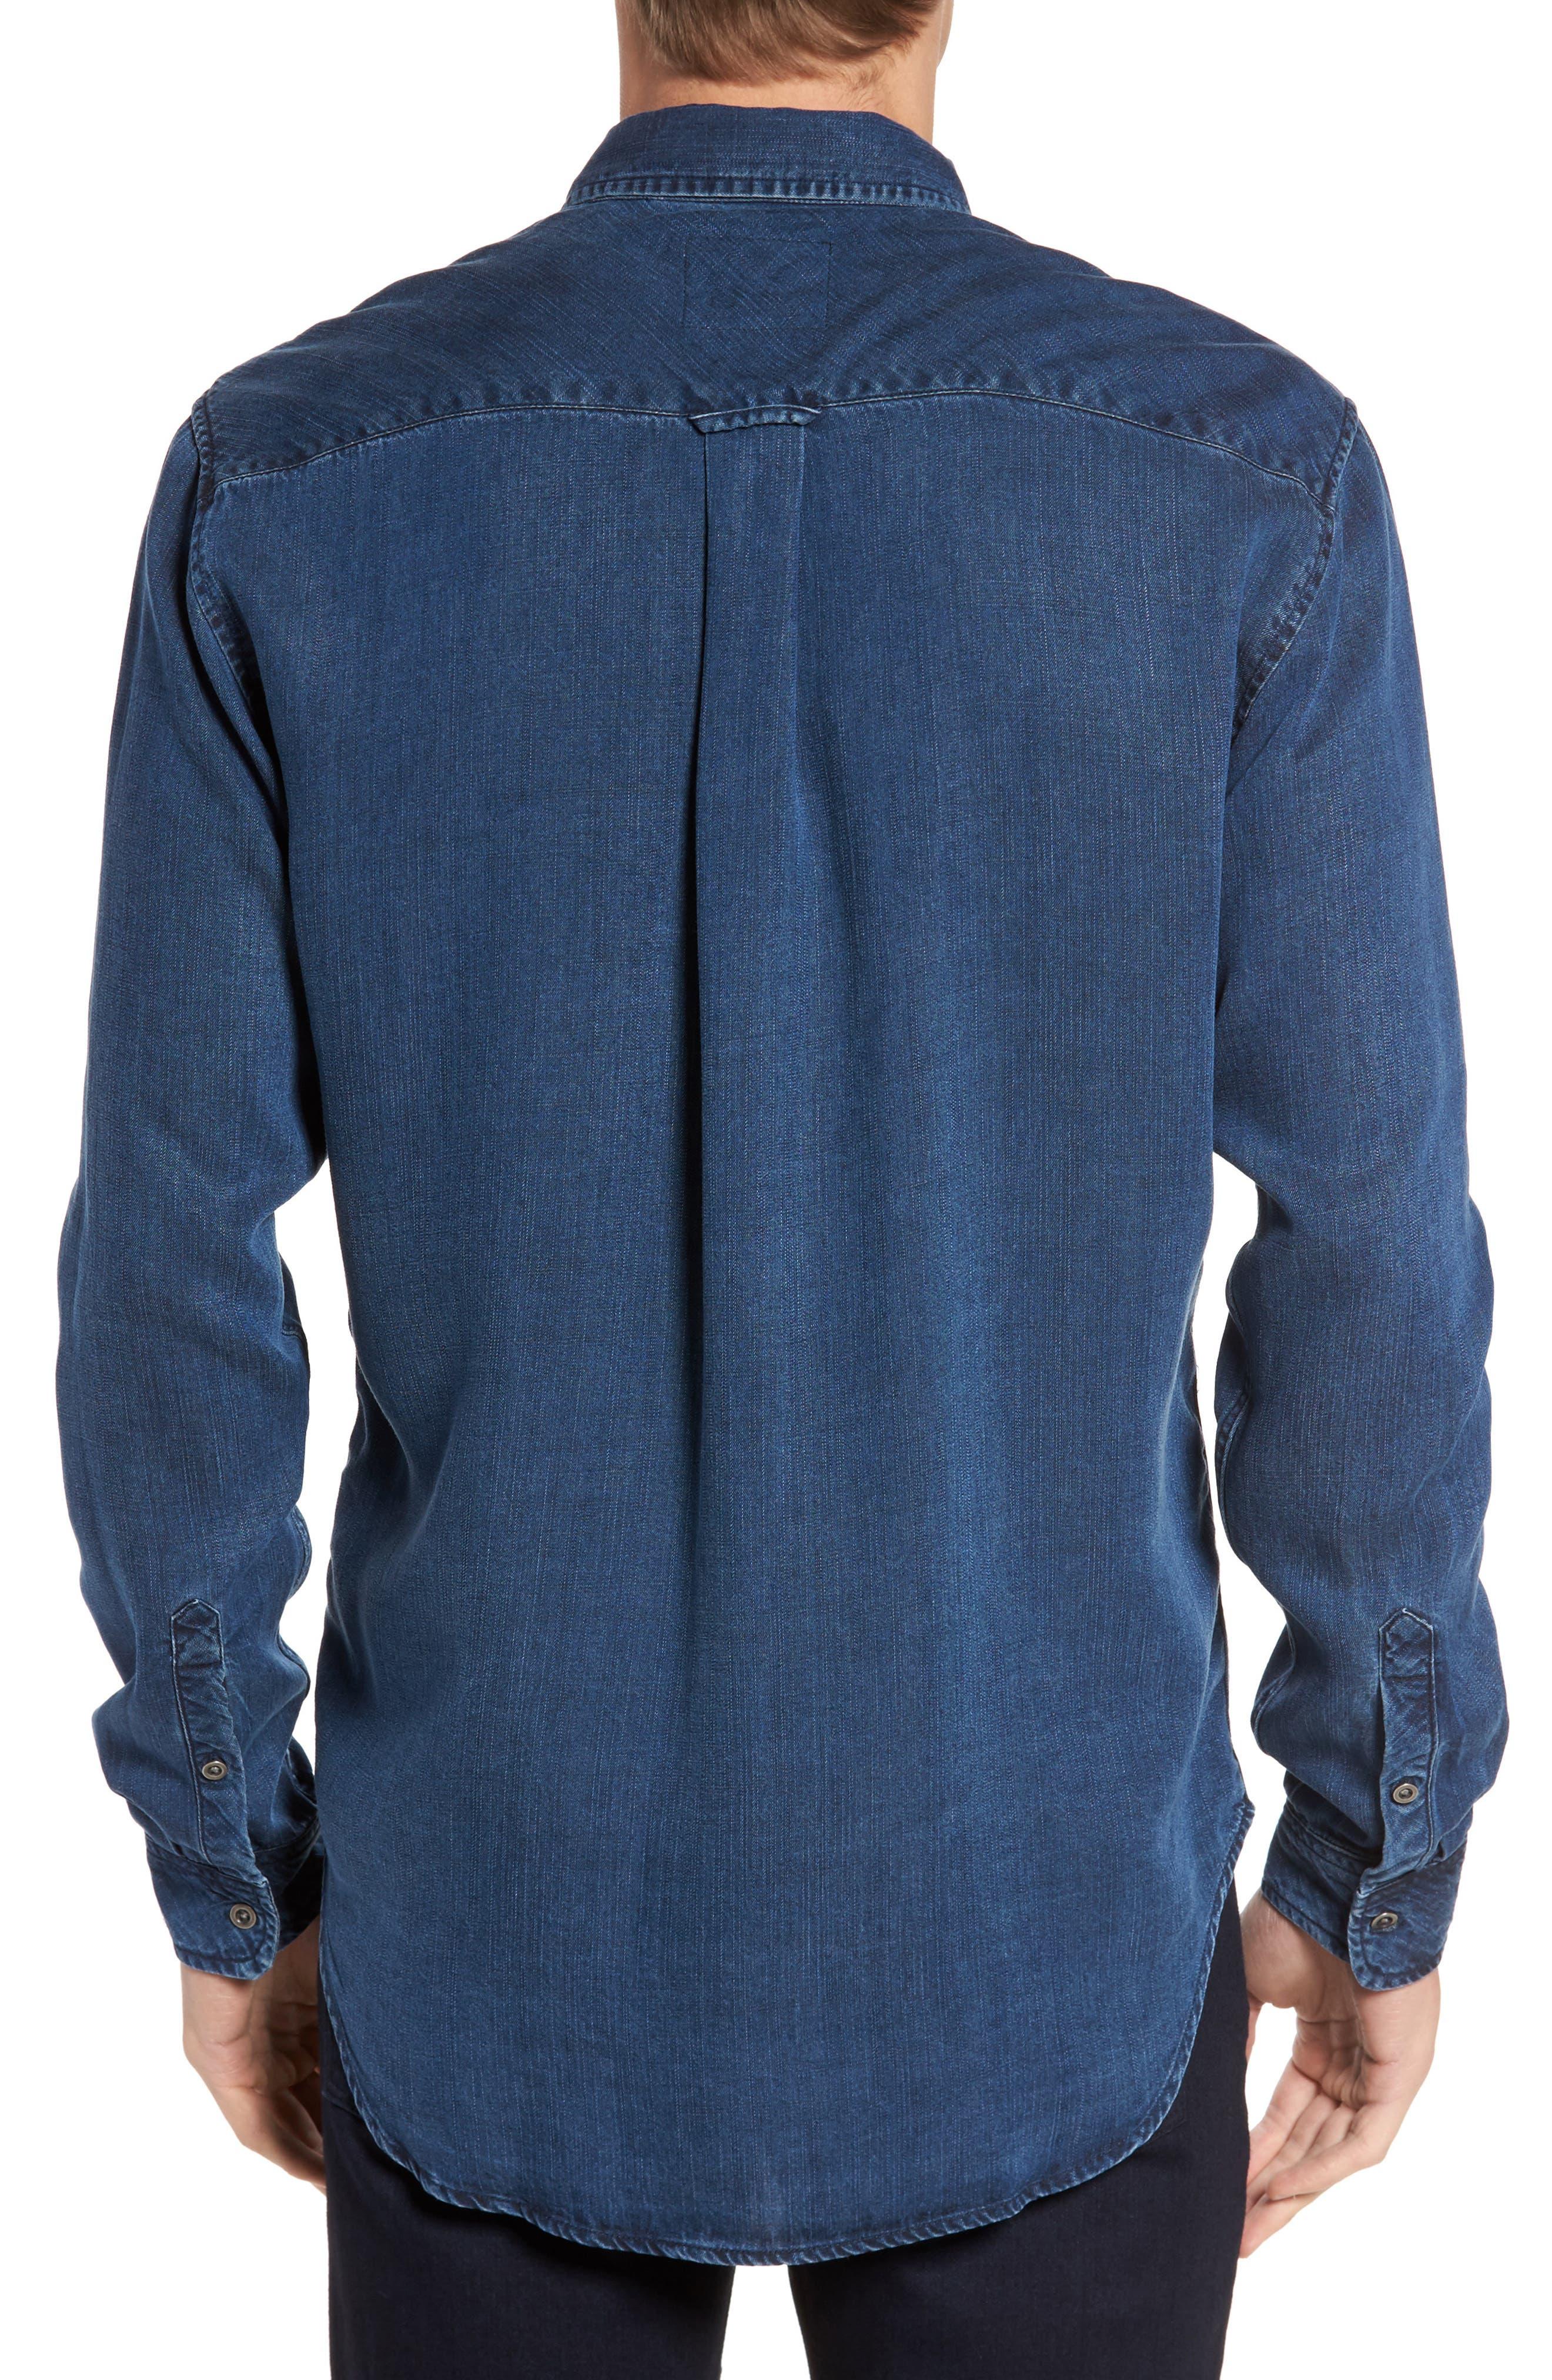 Beckford Denim Sport Shirt,                             Alternate thumbnail 2, color,                             Midnight Vintage